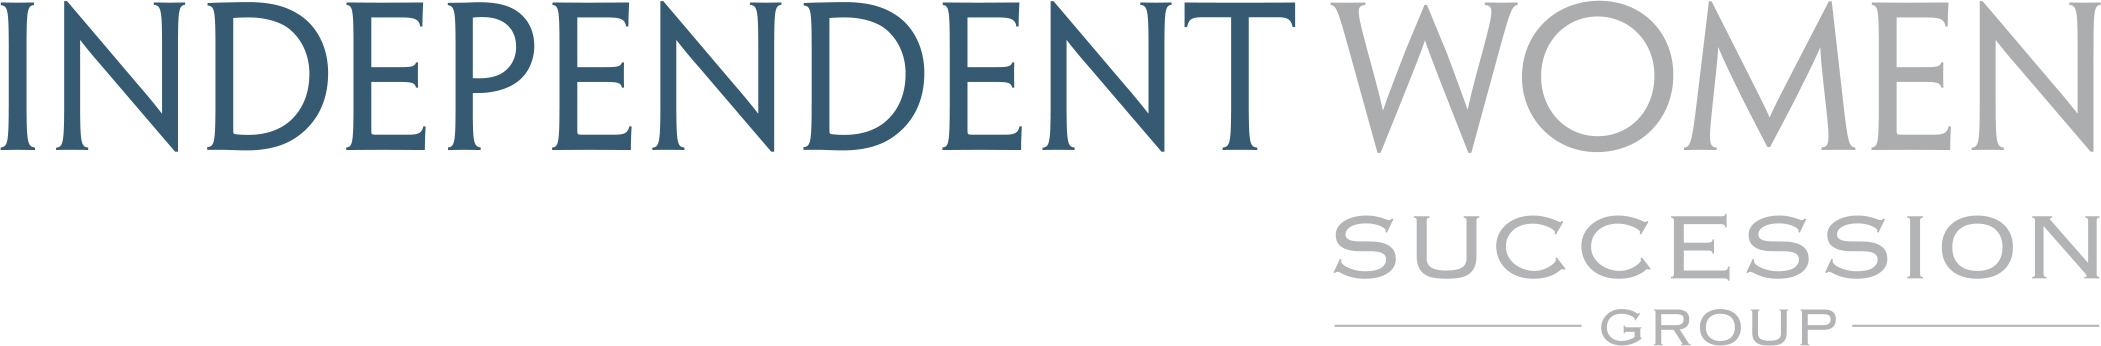 IW long logo